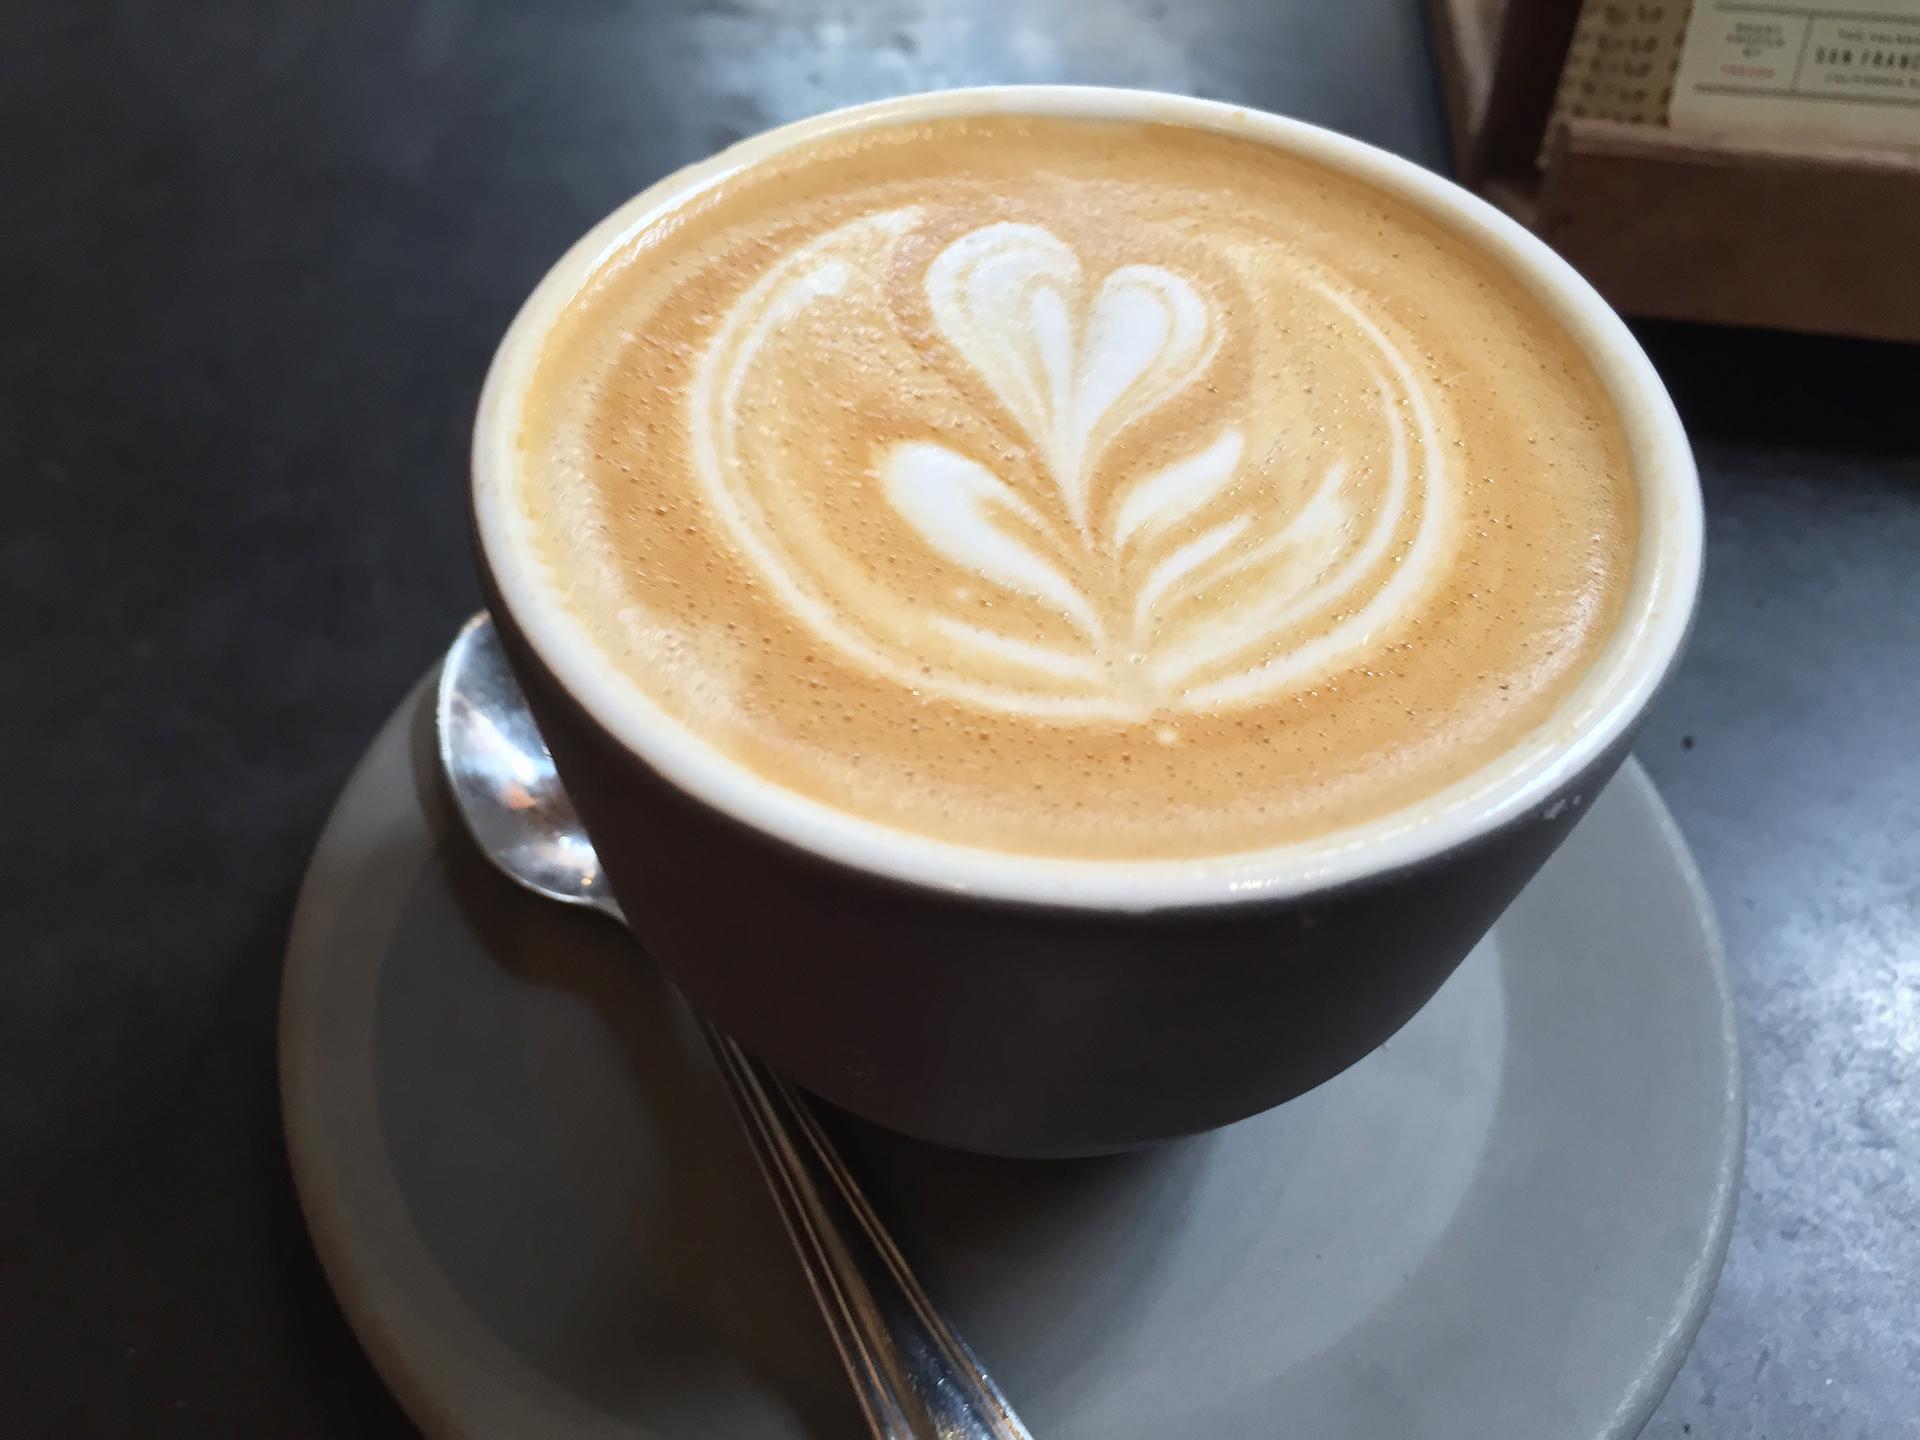 Four Barrel cappuccino